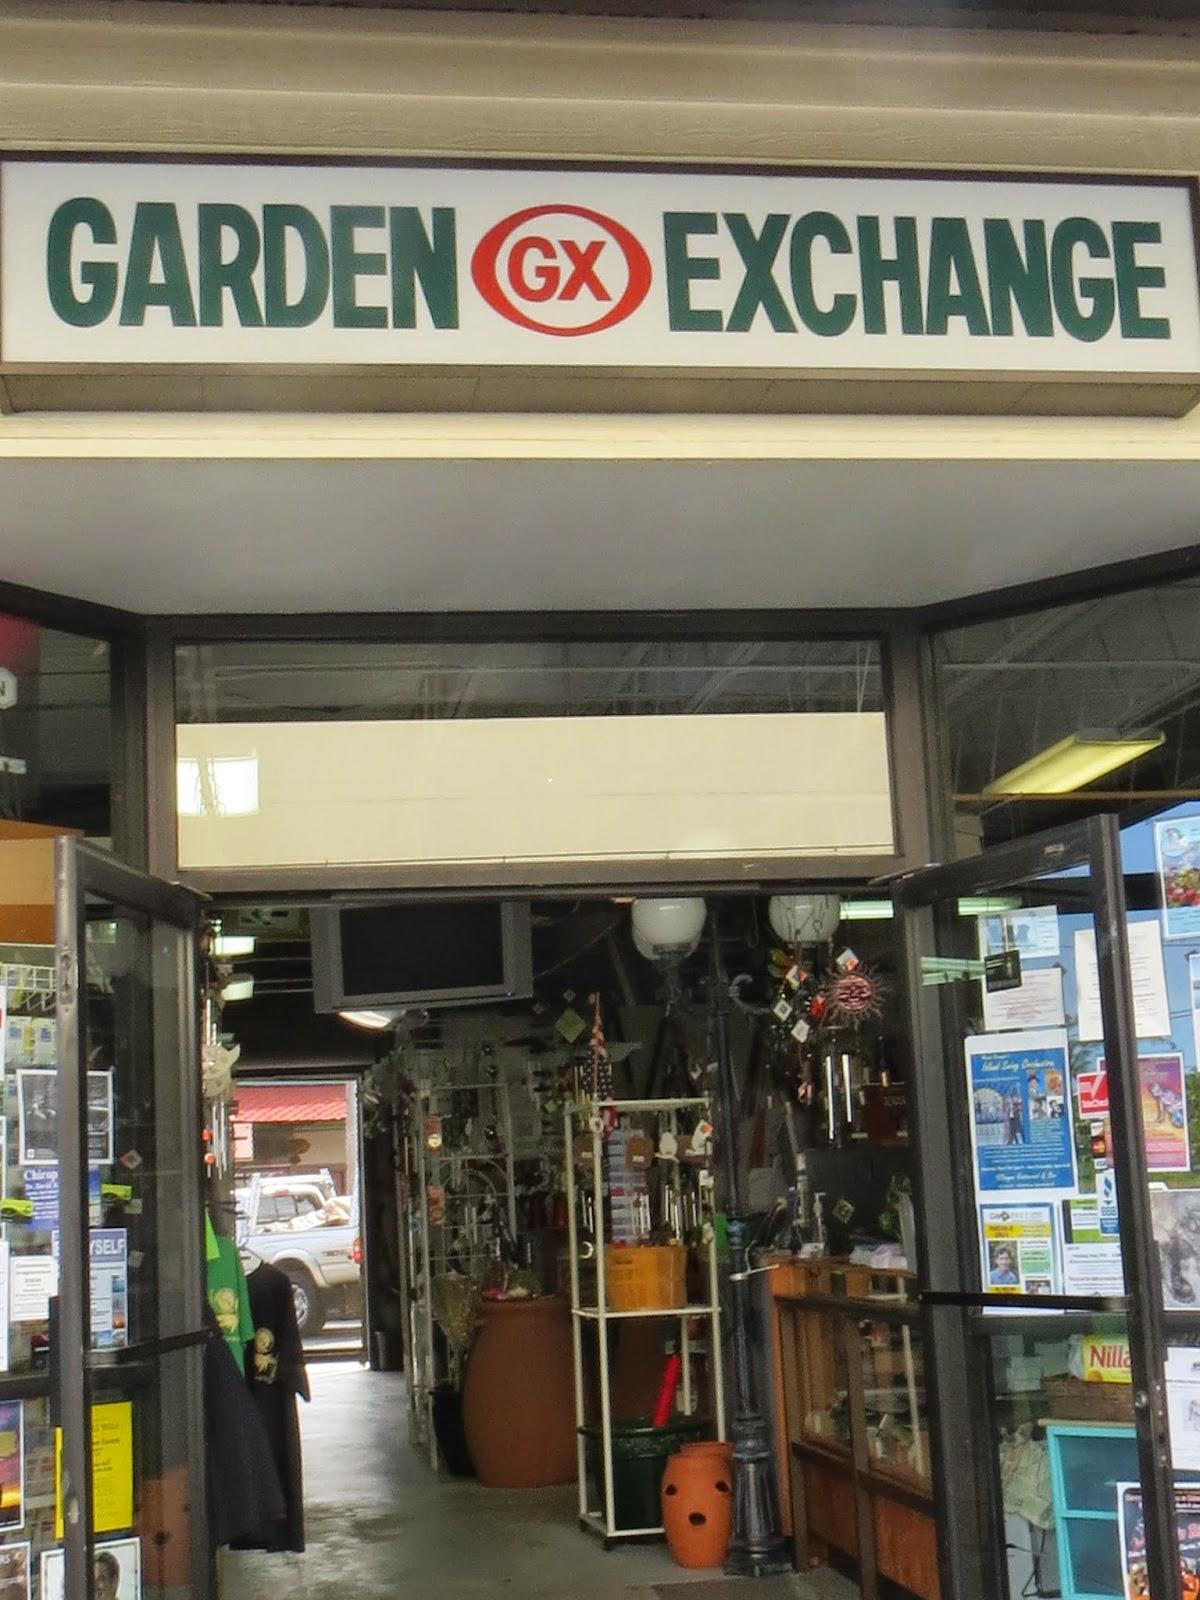 Garden Exchange In Hilo Has All Things For The Garden: Fertilizers, Garden  Tools, Seeds, Garden Art, Soil Amendments And Plants.